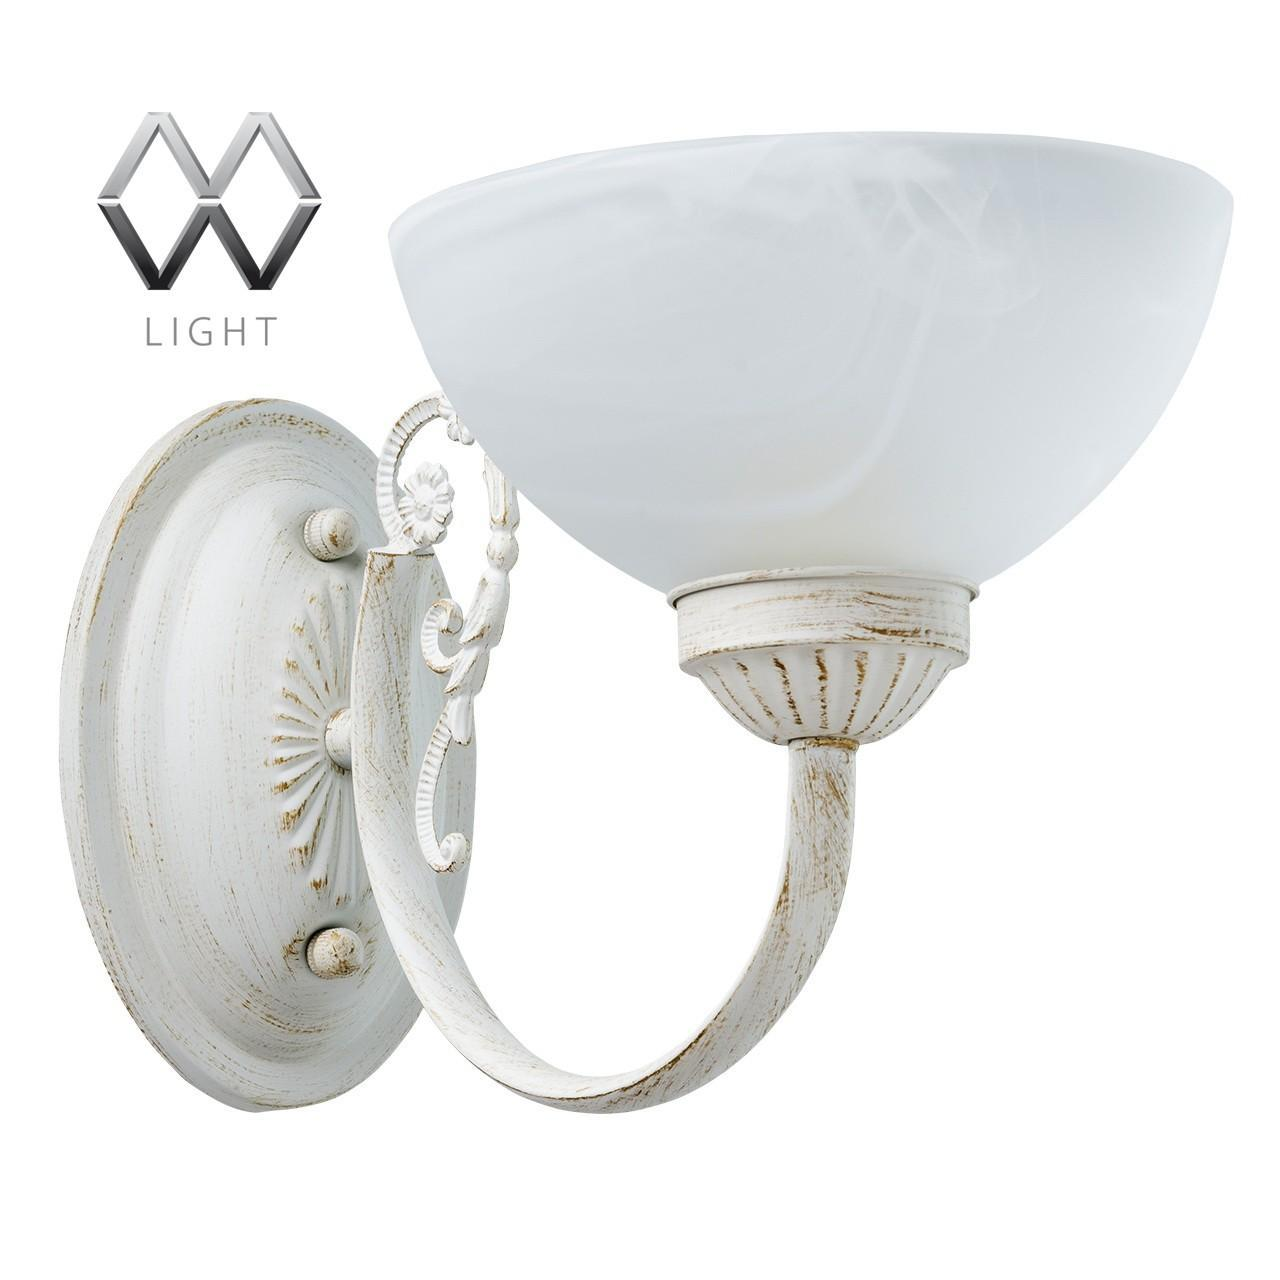 Бра MW-Light Олимп 5 318024301 бра mw light олимп 318020801